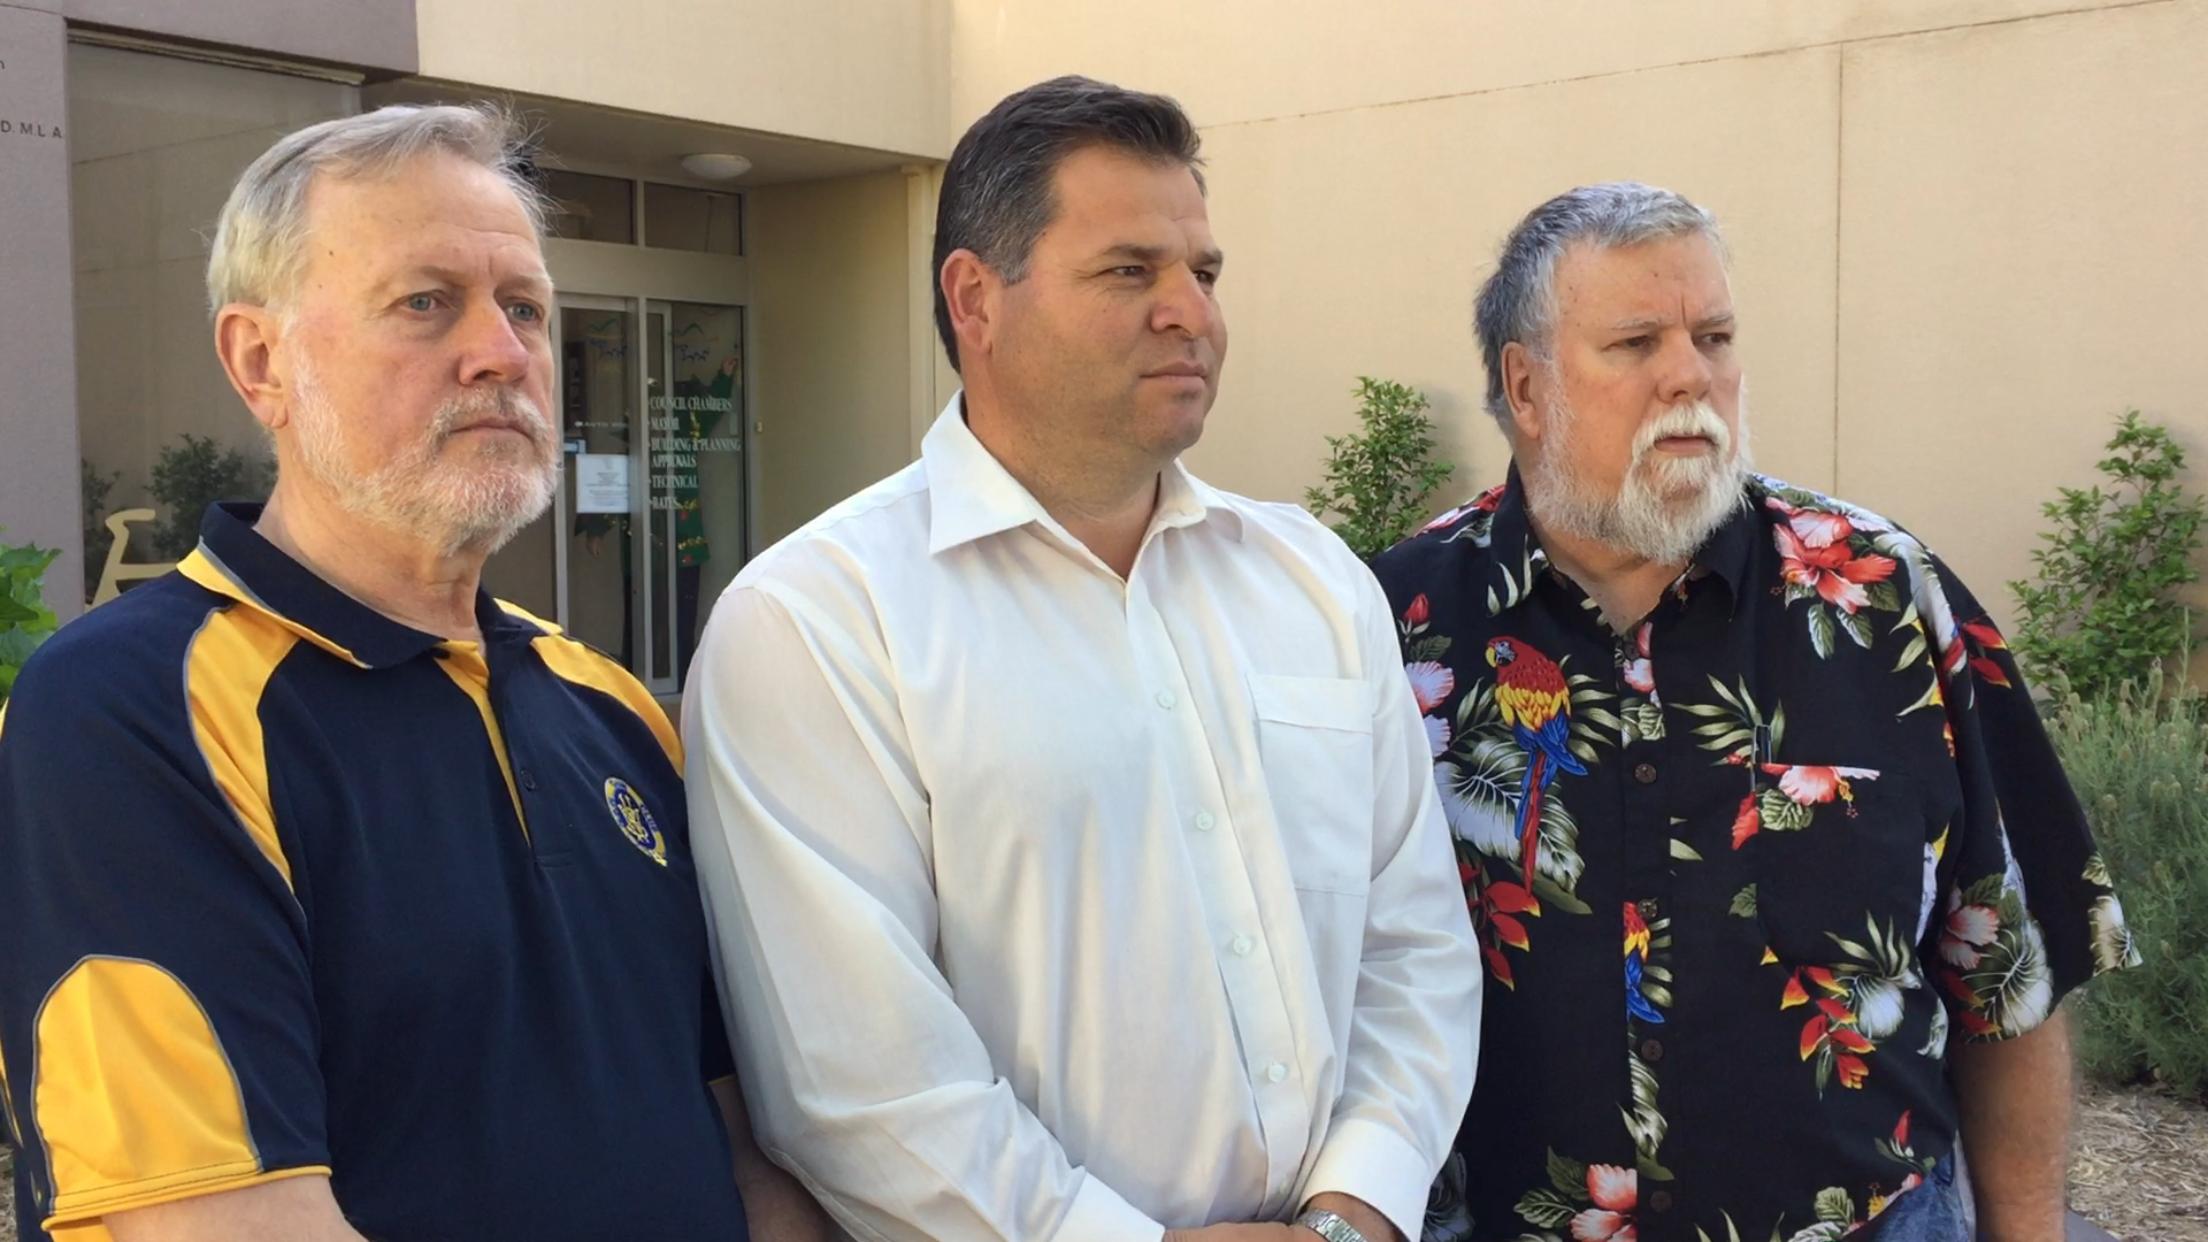 Robert Borsak, Robert Brown and Philip Donato